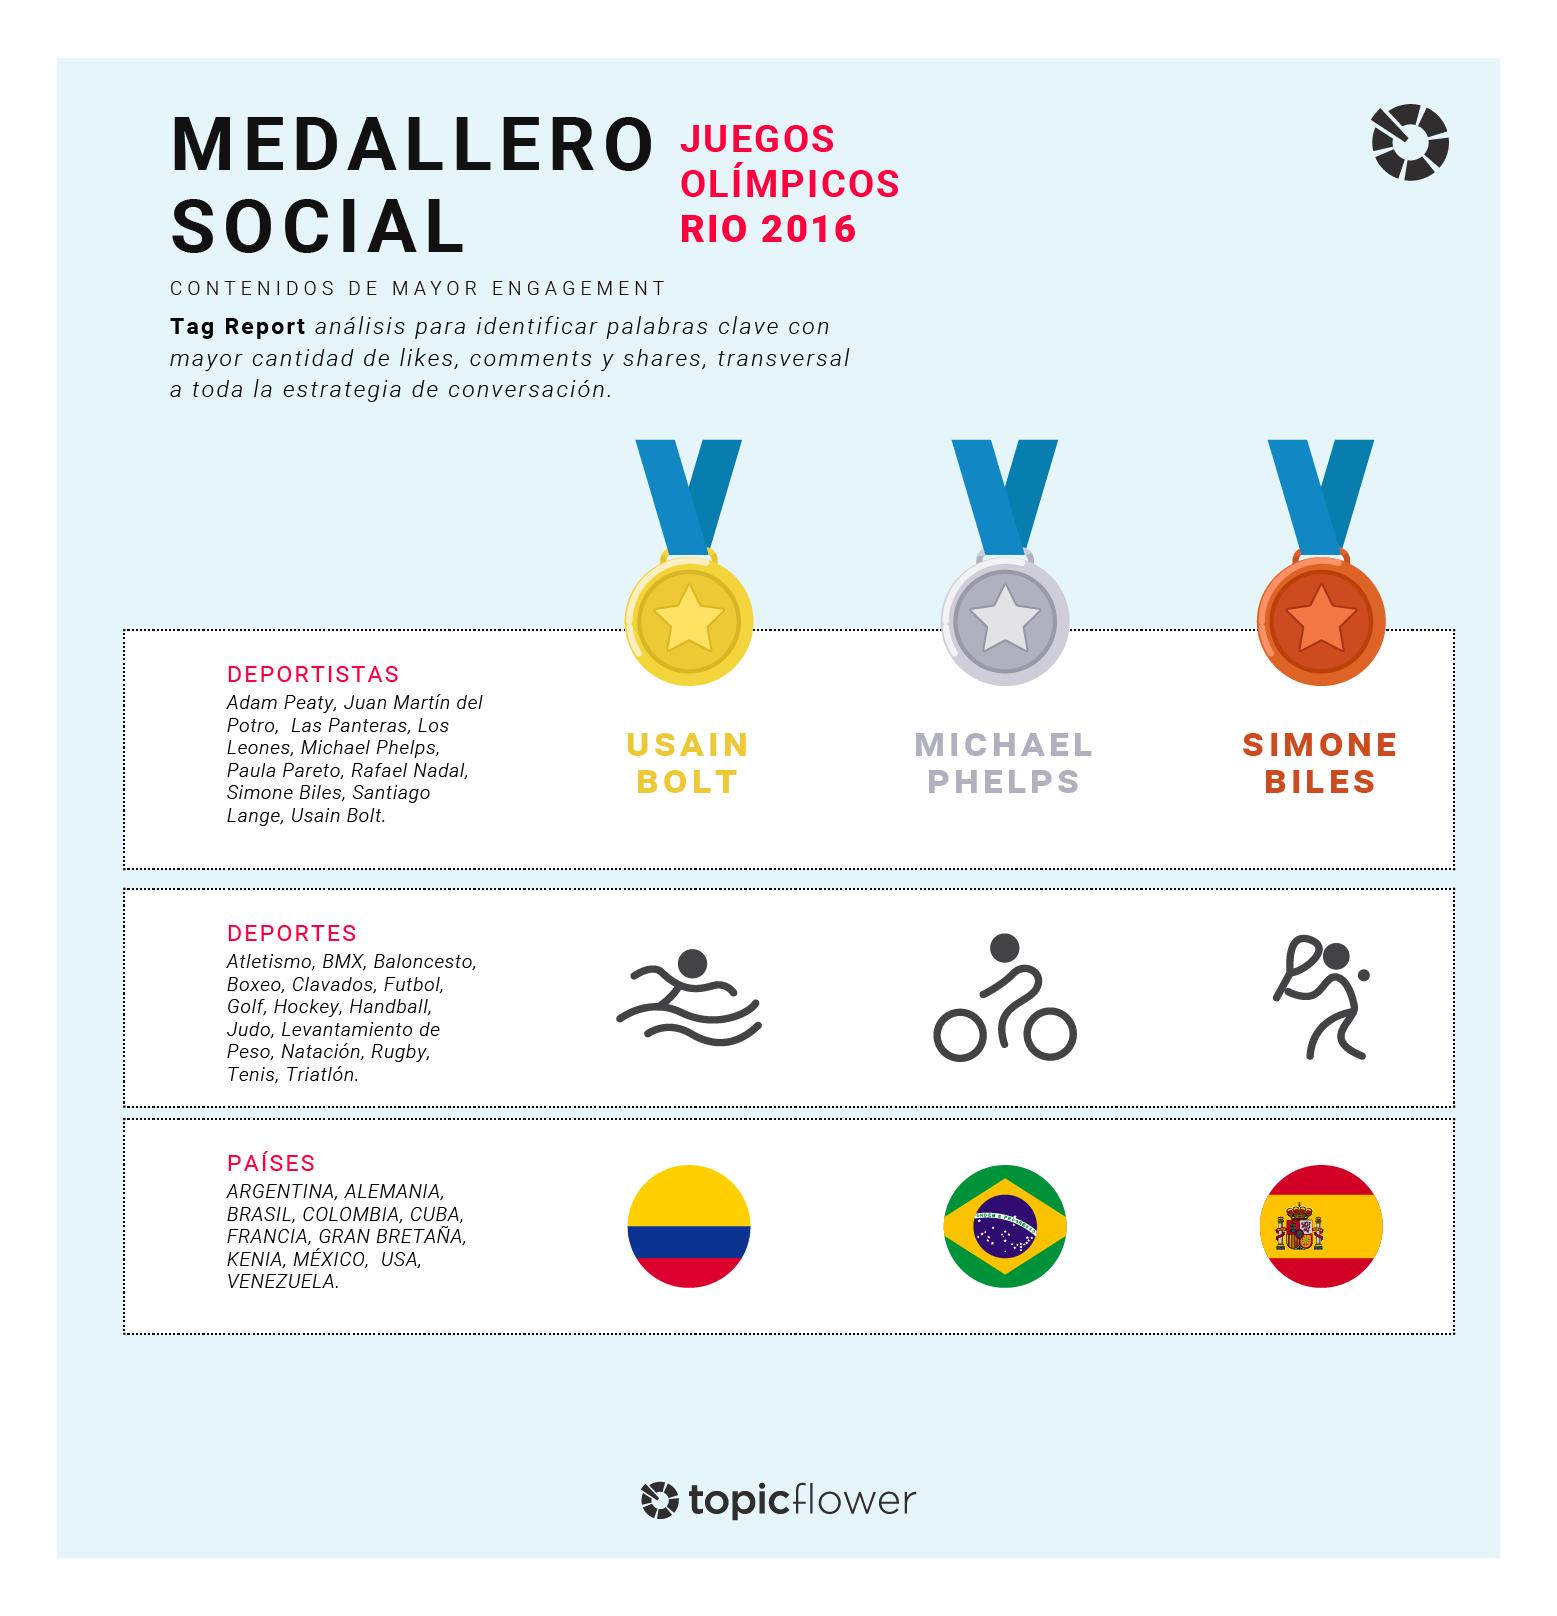 jjoo2_medallero-social-dibujos